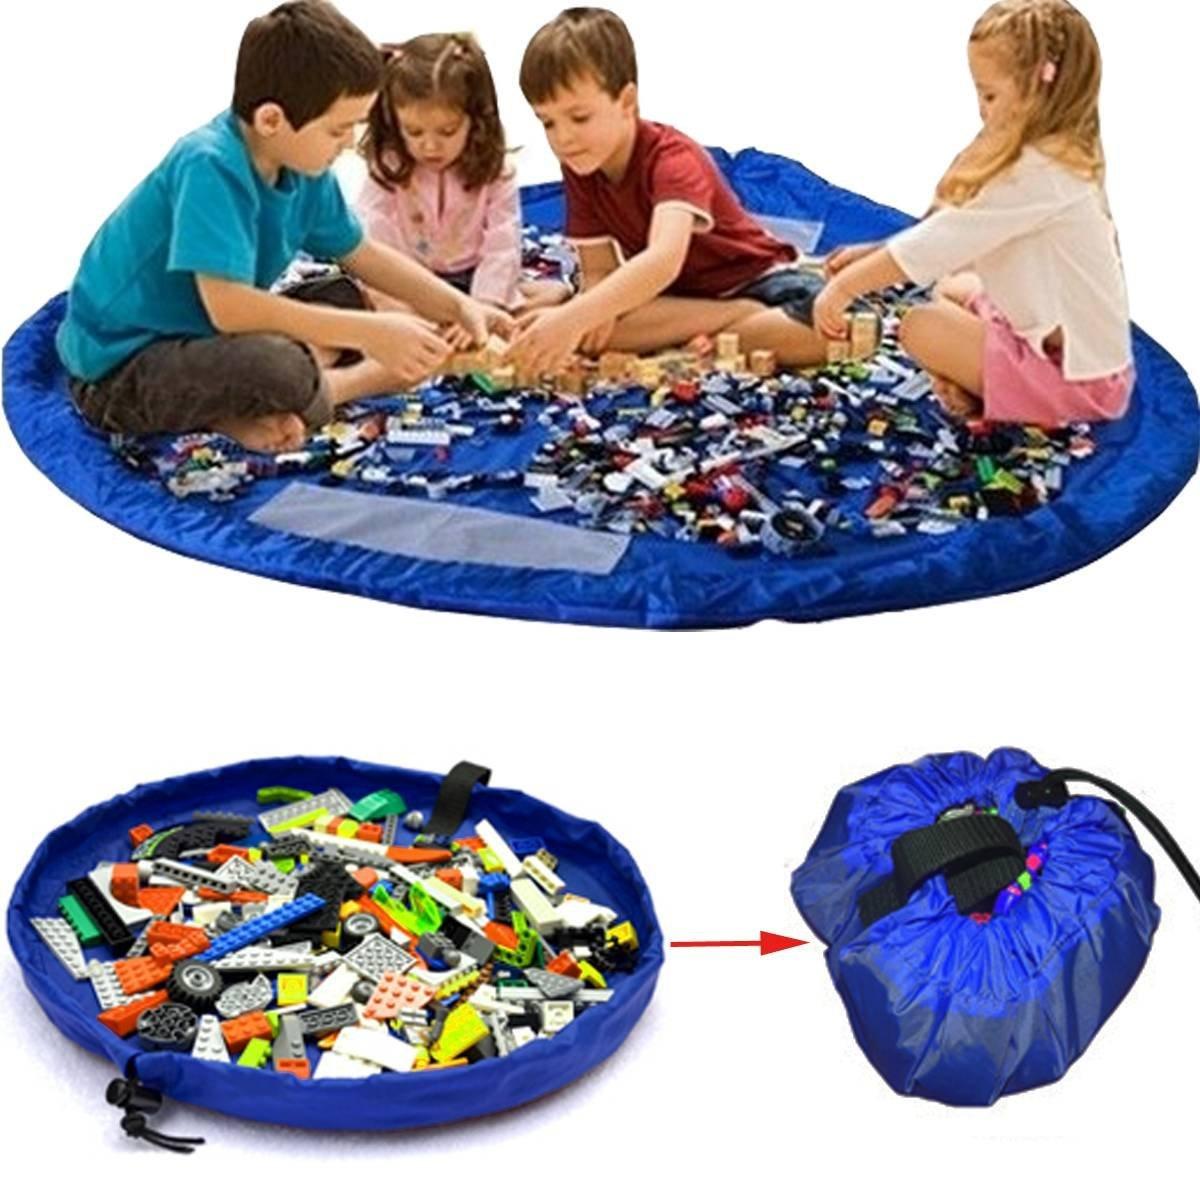 Lego Sack 2 in 1 large storage bag tidy toys play mat rug organiser